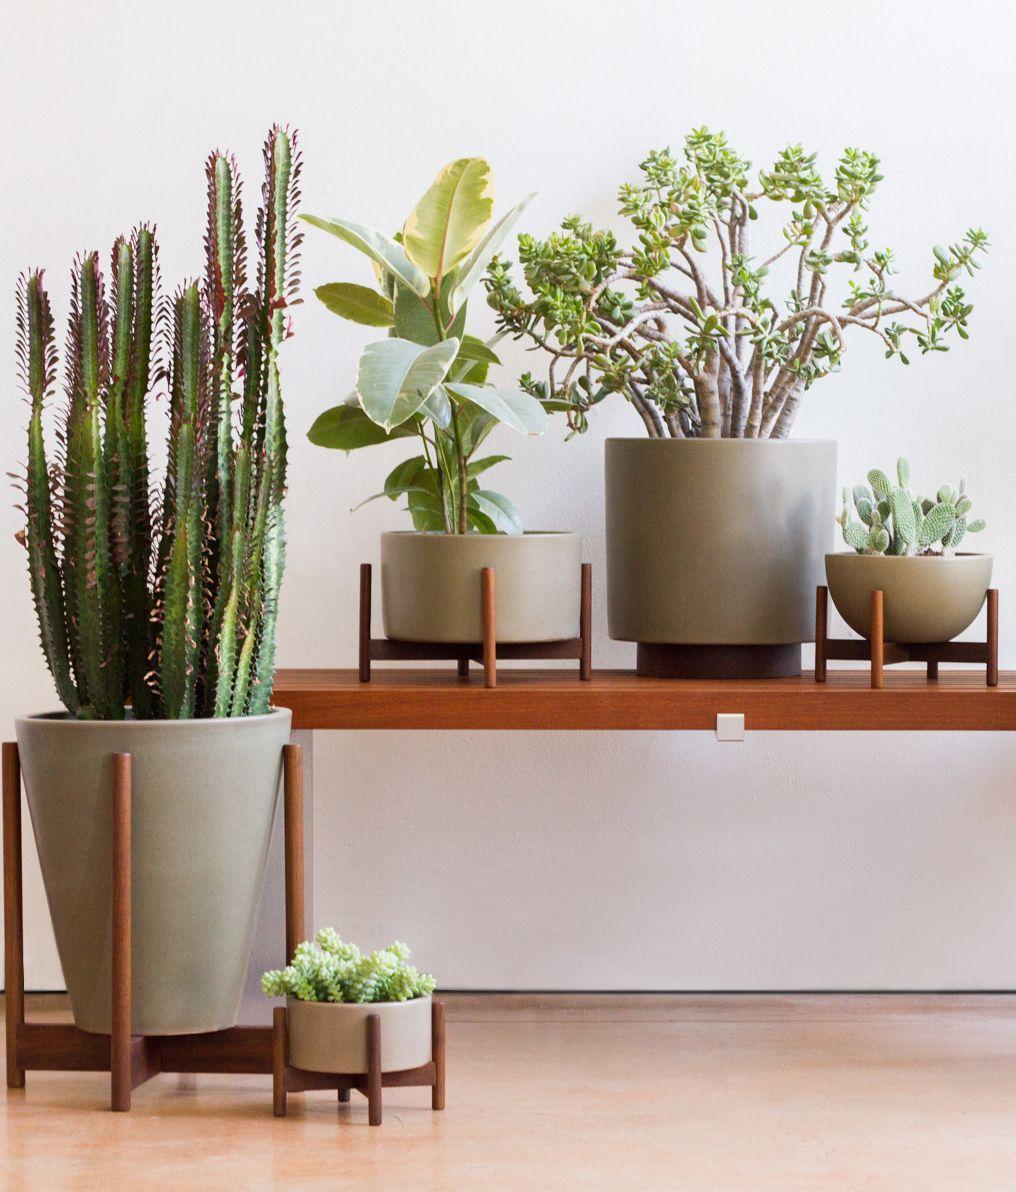 Modernica Case Study Ceramics Planten Planters Interieur